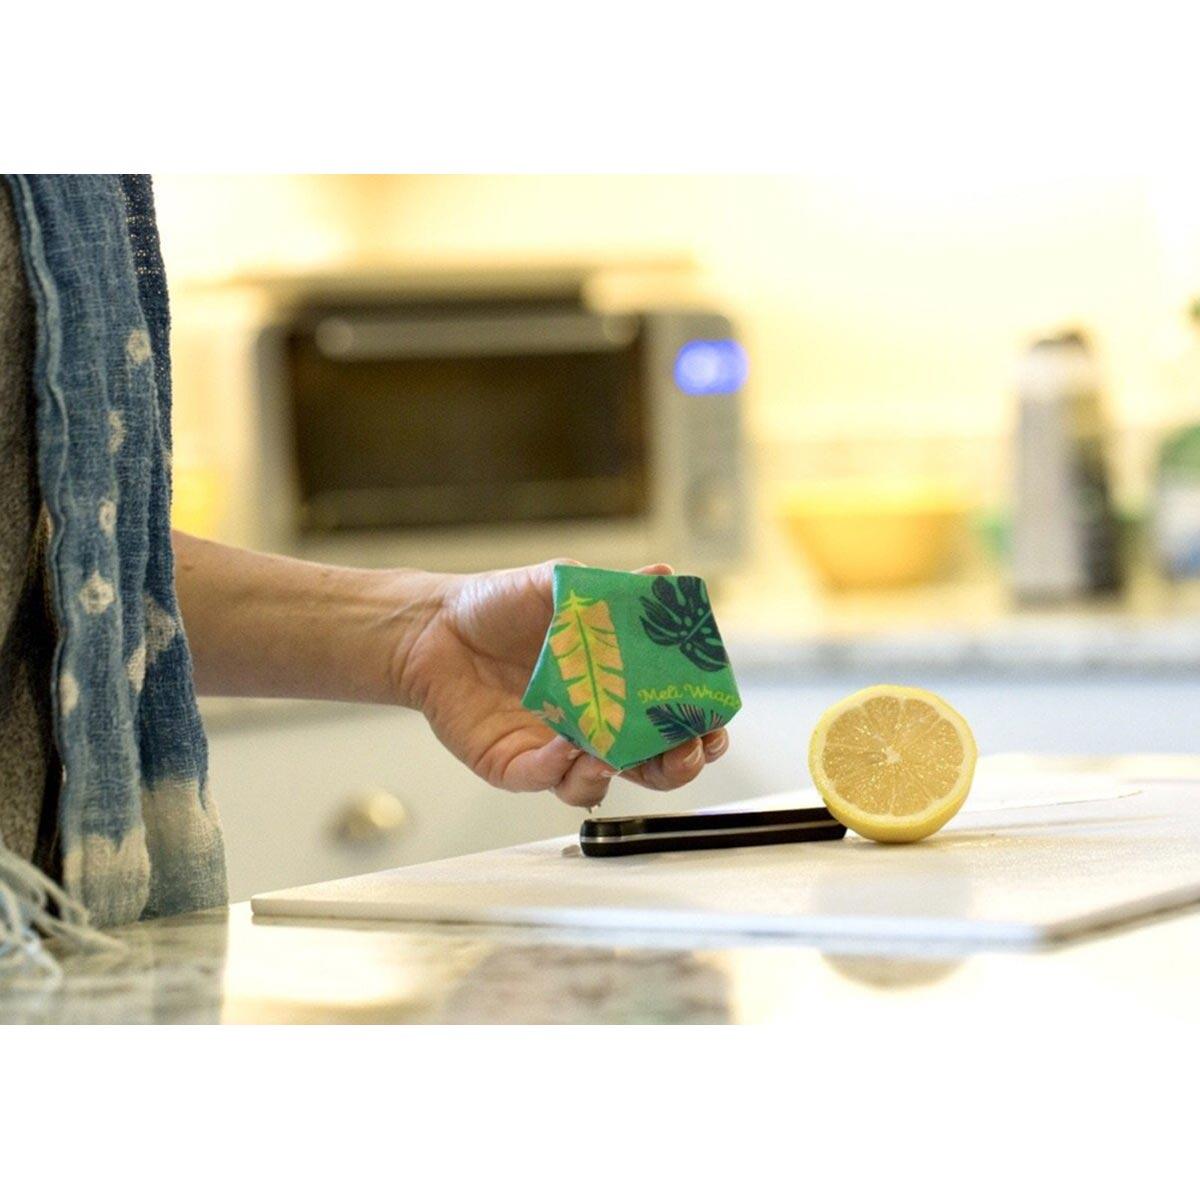 Meli Wraps 3-Pack (Sm/Med/Lrg) Reusable Beeswax Food Wrap, Lau (Monstera Green) Print